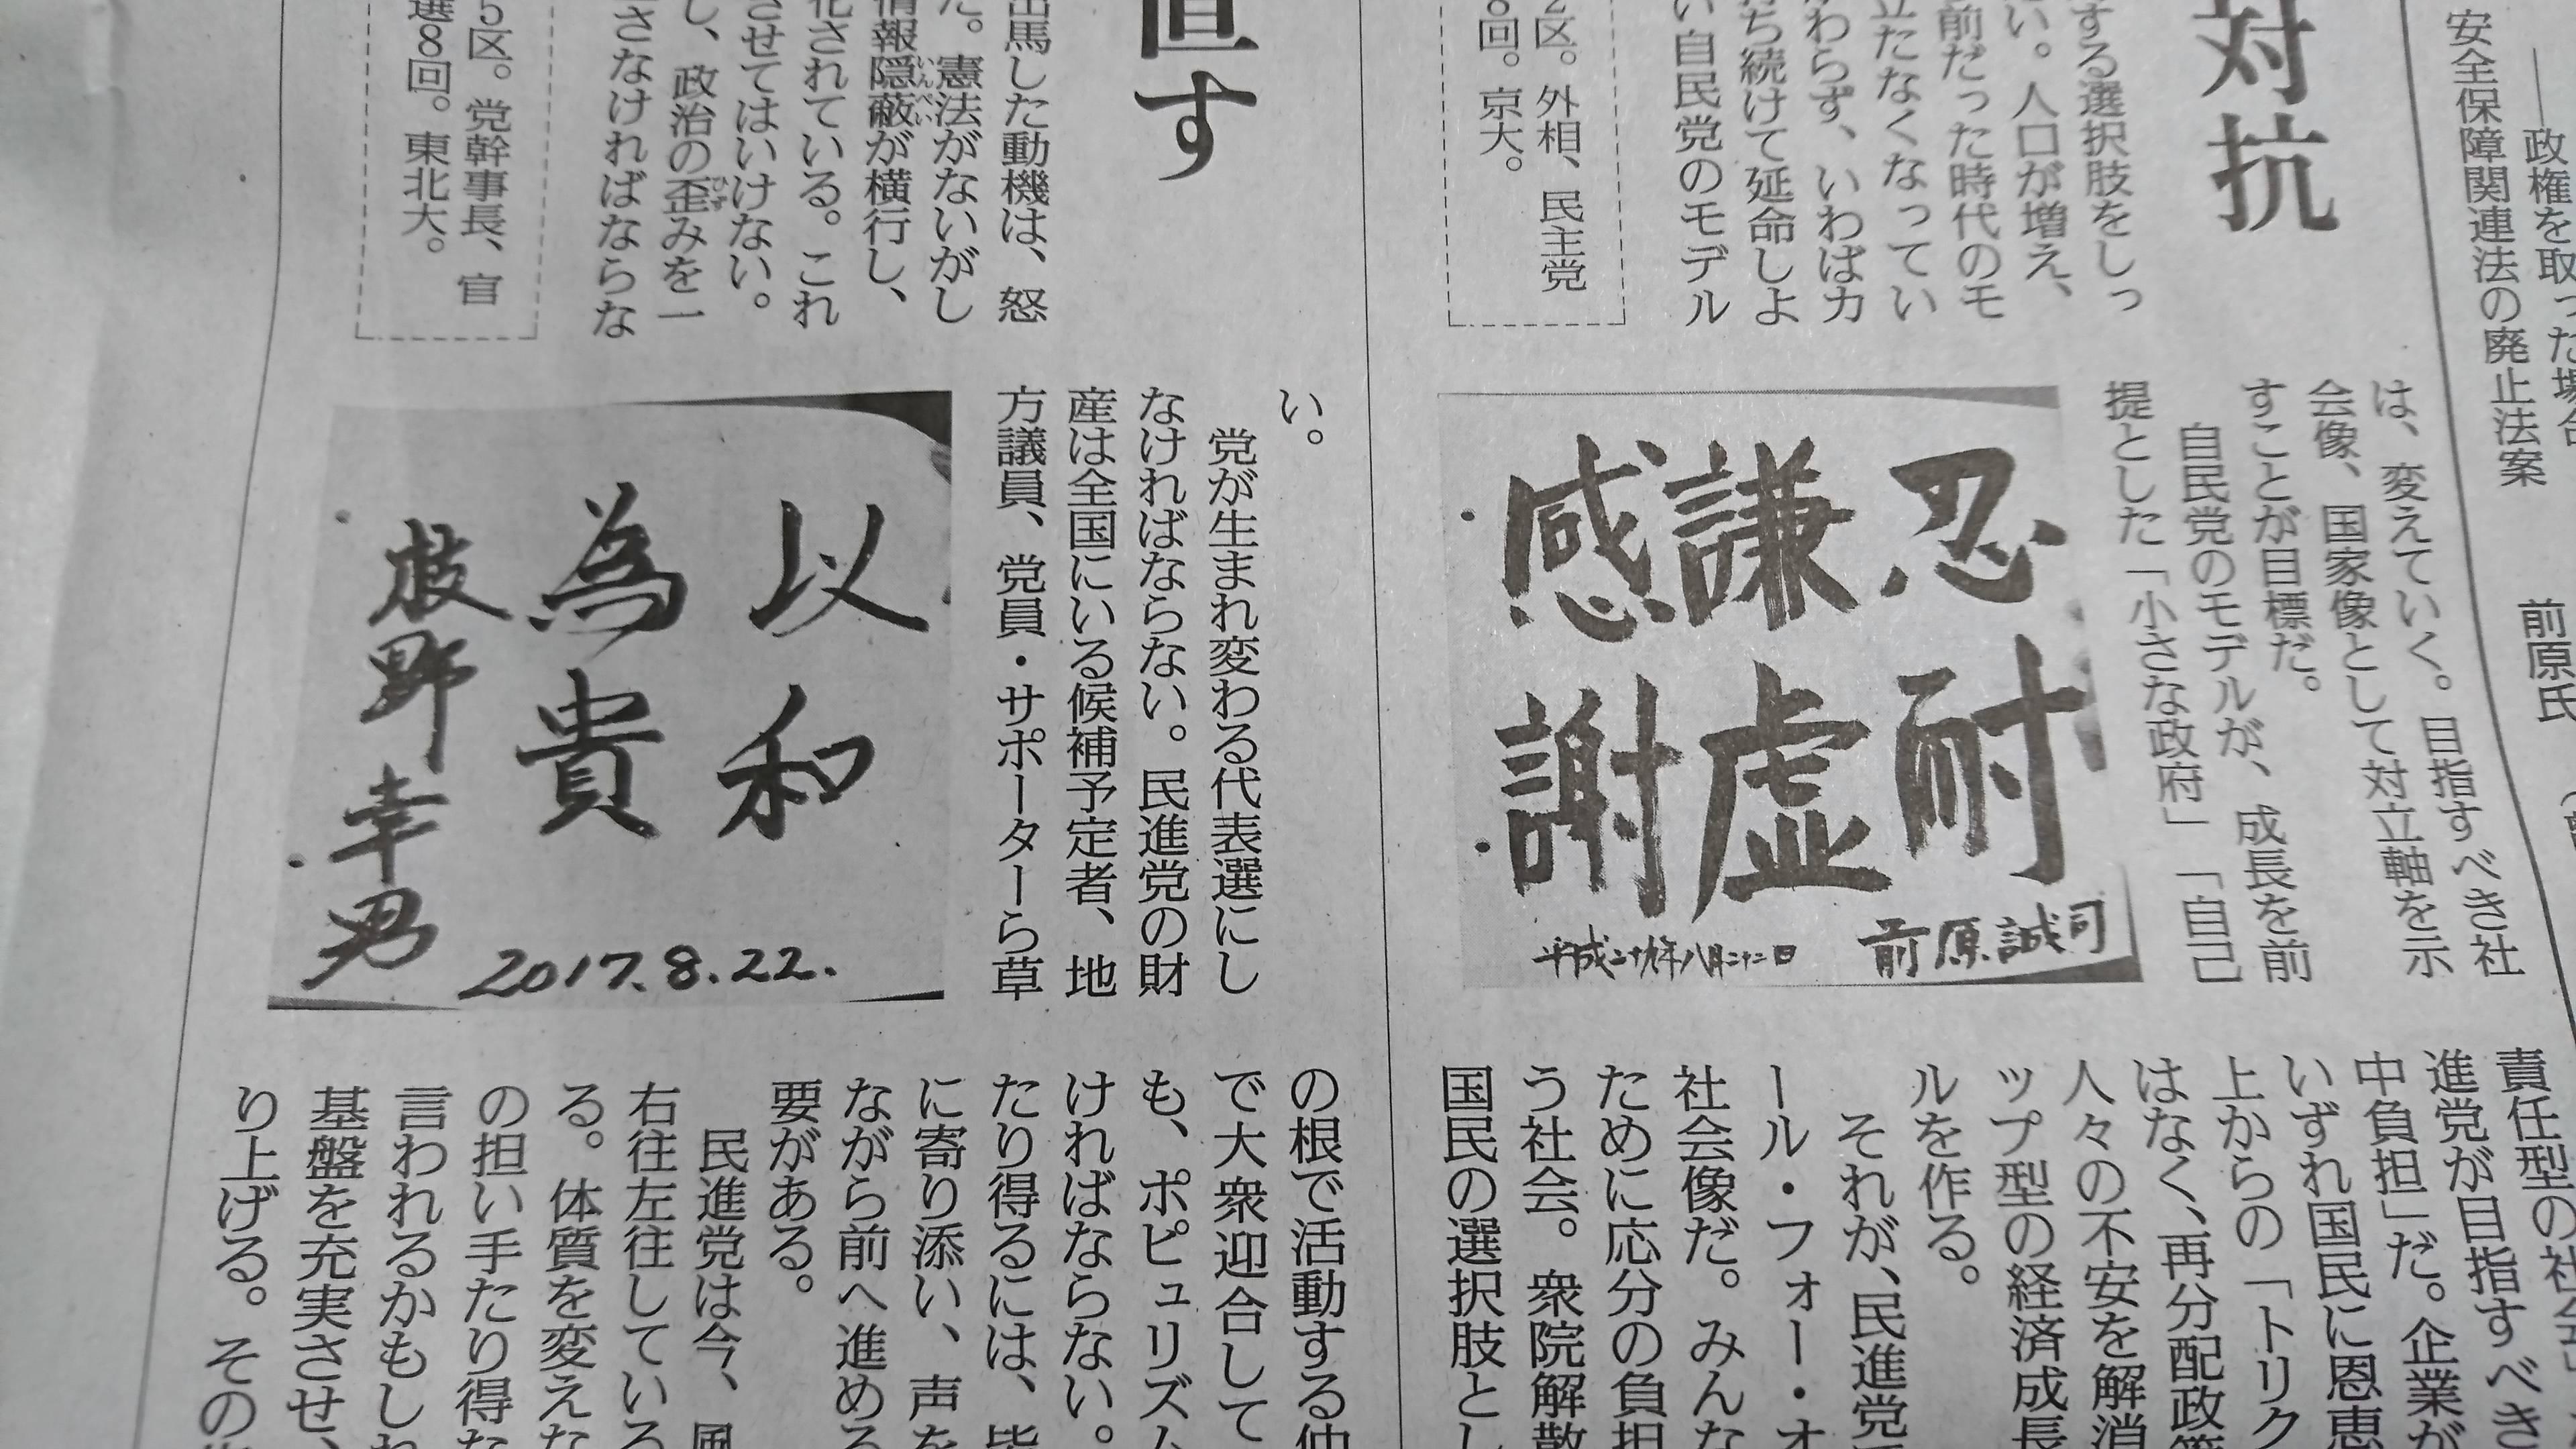 【民進党】前原誠司代表の書道が小学生レベルでワロタwwwwwwwwwwwwwwwのサムネイル画像